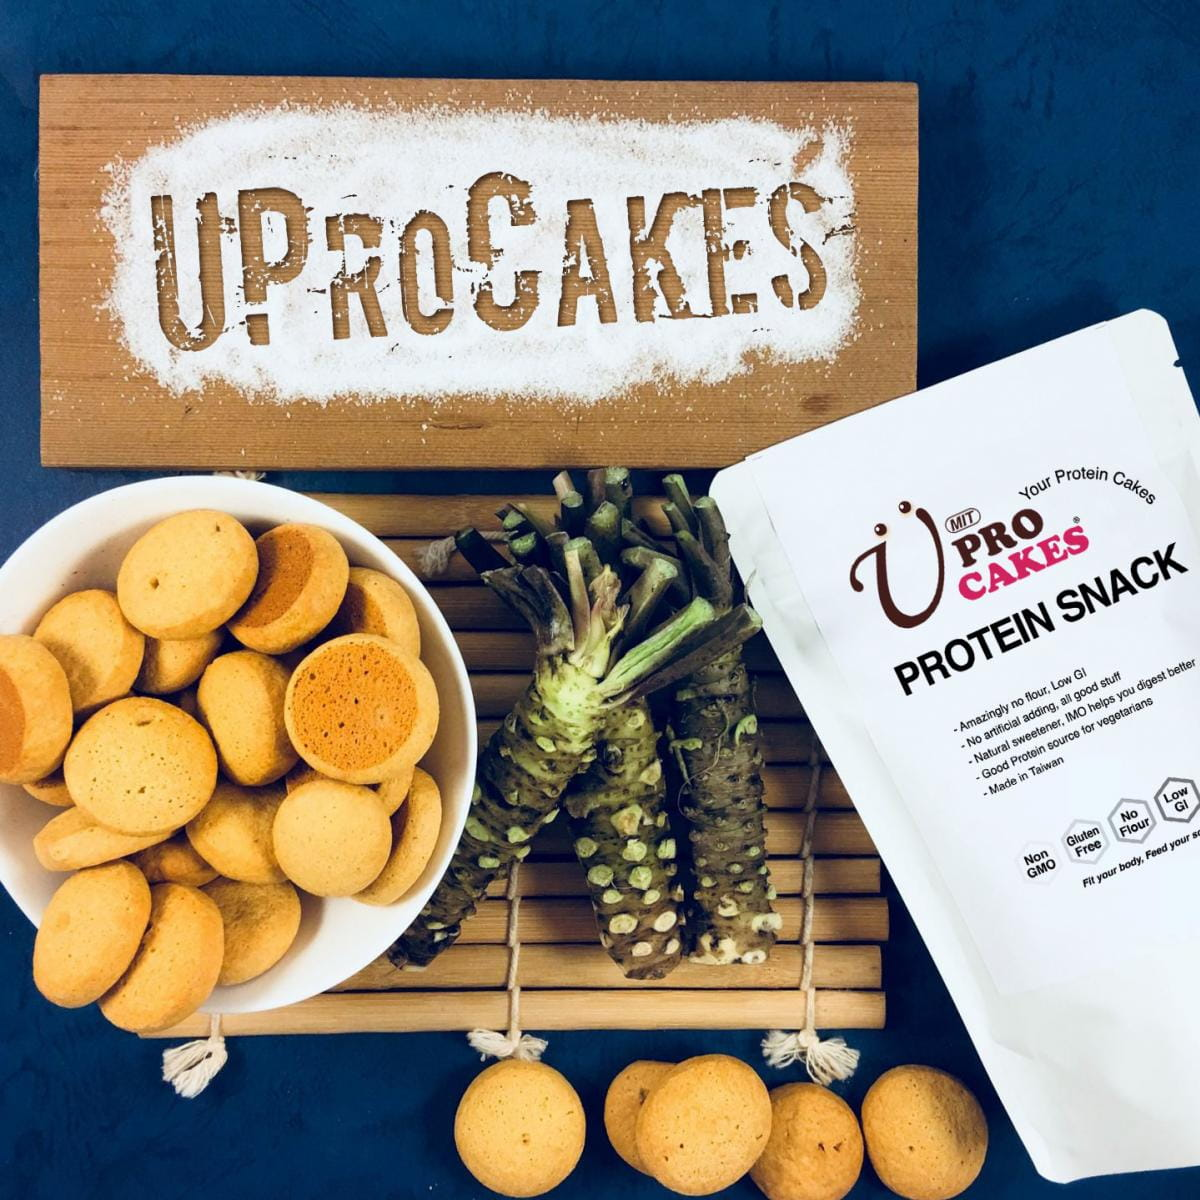 【Your Protein Cakes】悠沛克 Protein cakes 手作高蛋白一口酥 9